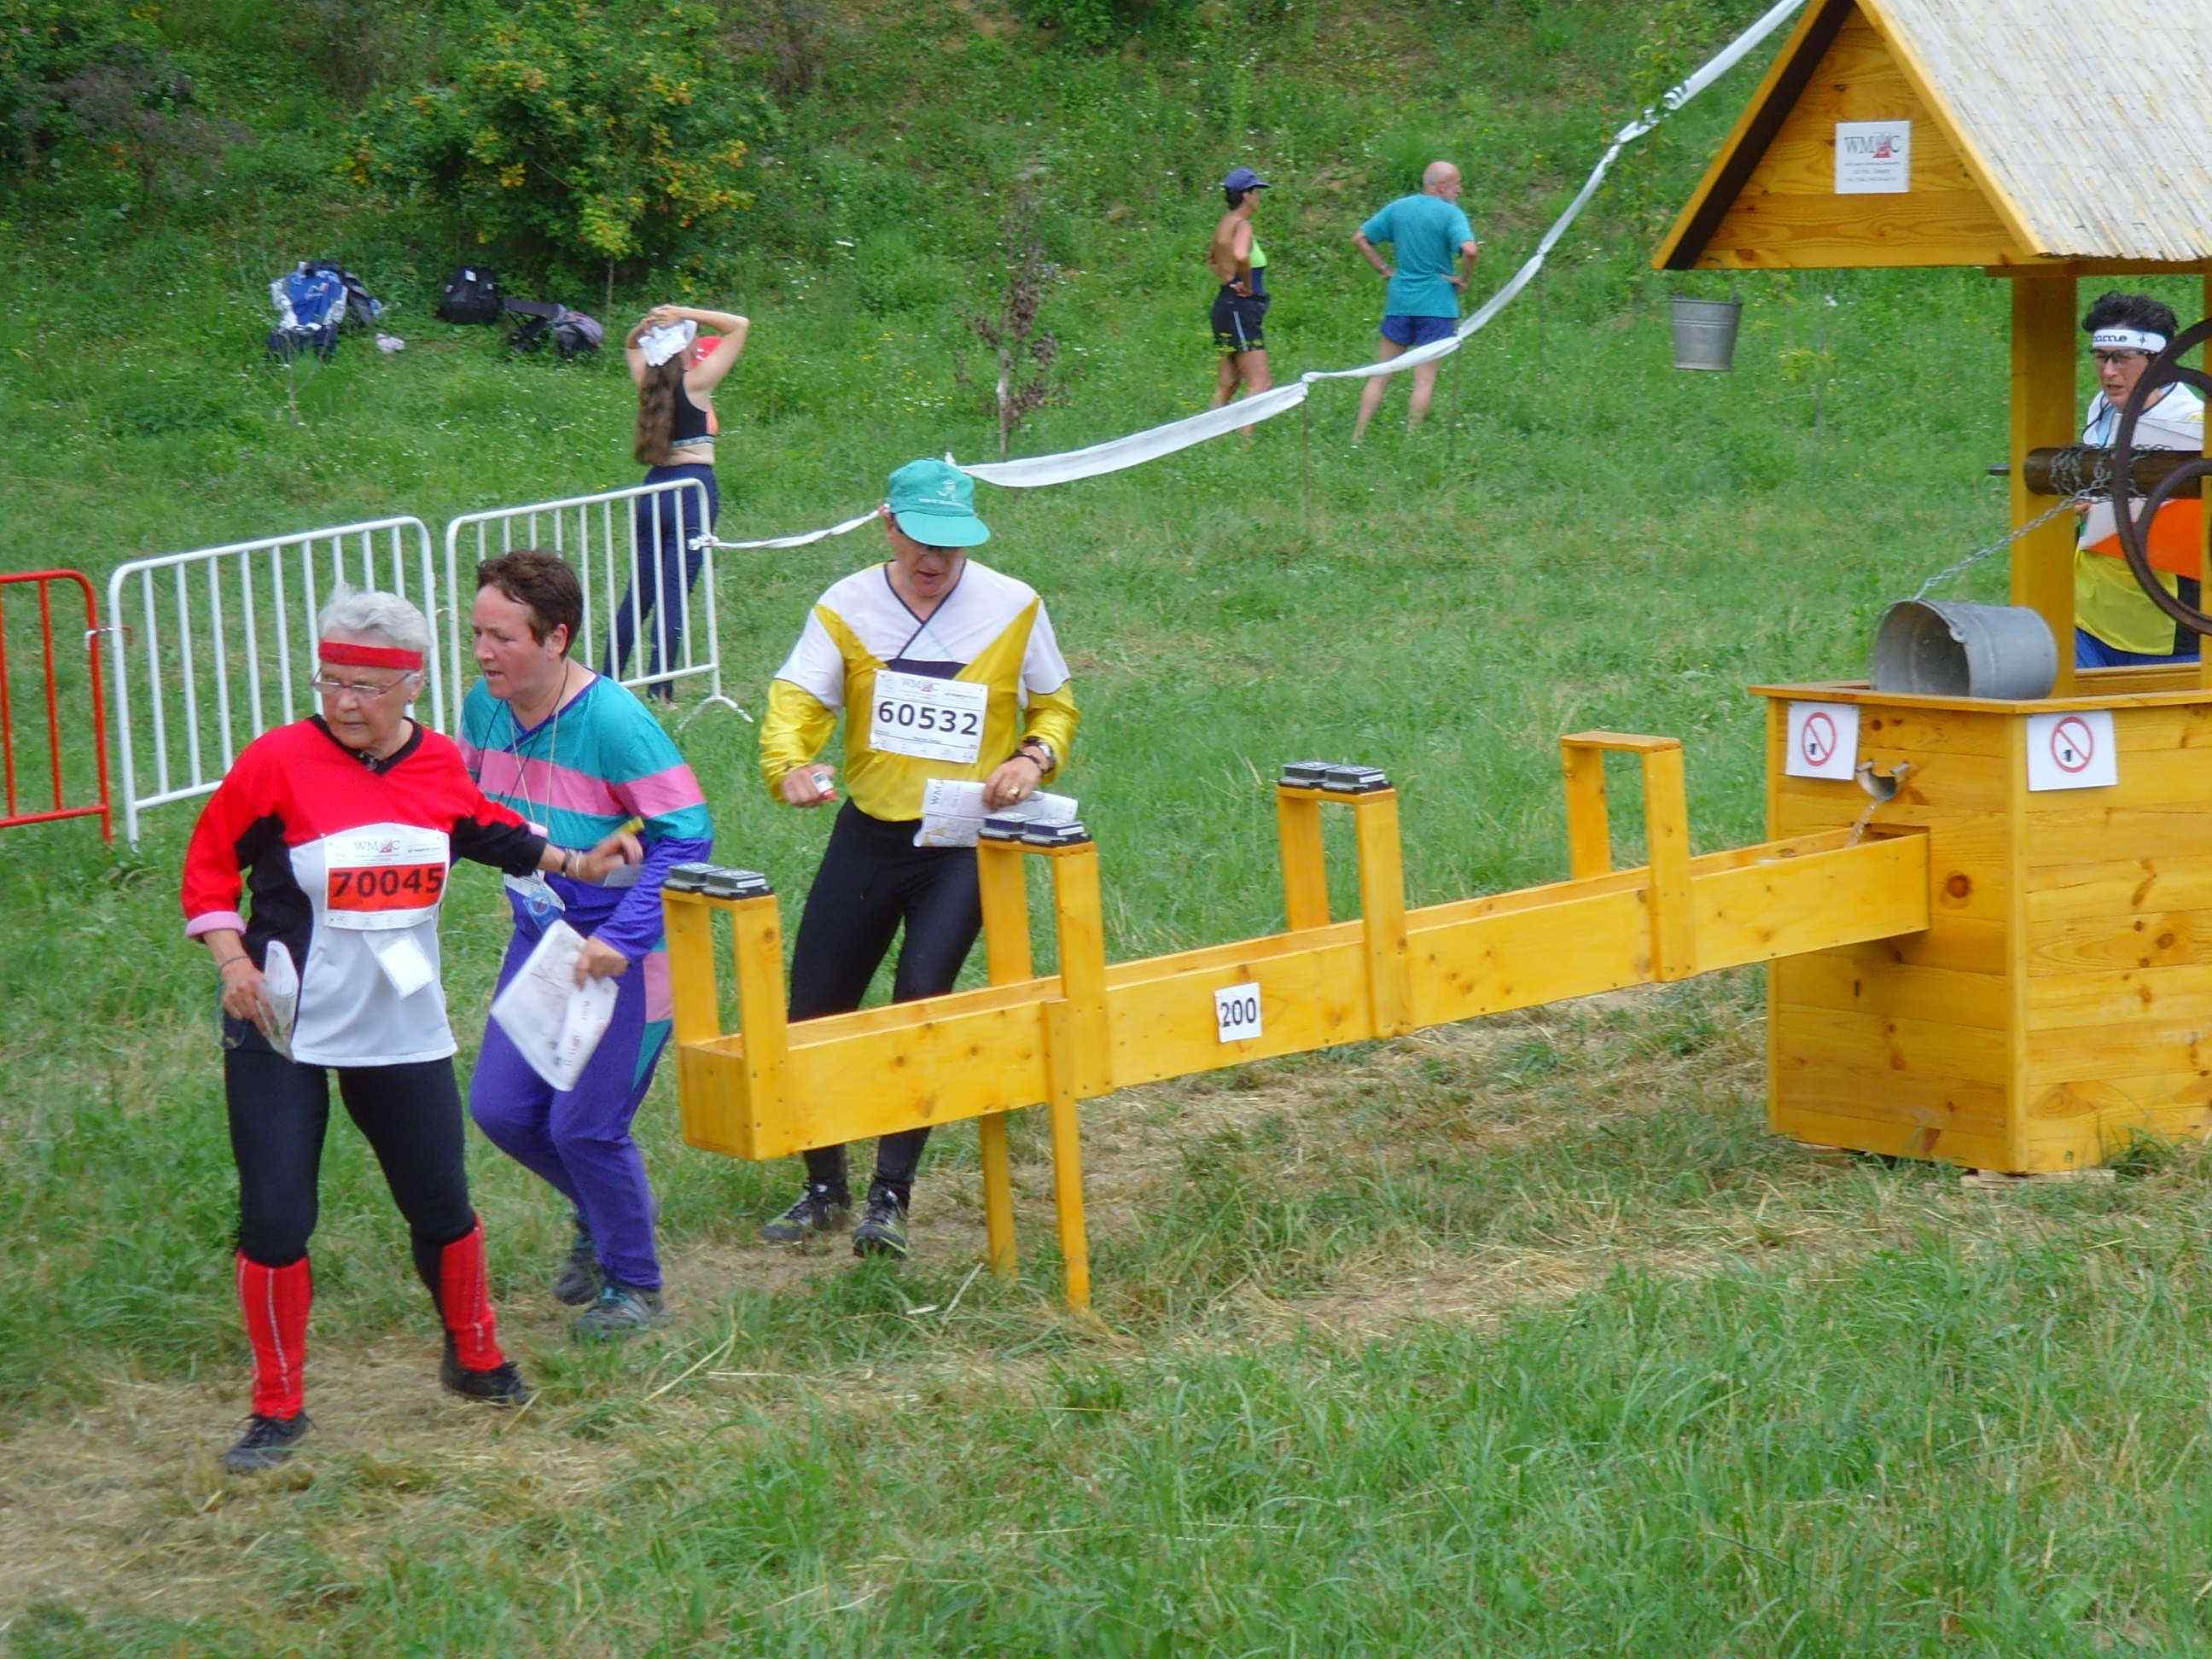 world-masters-orienteering-championships-2011-tagebuch-3.jpg